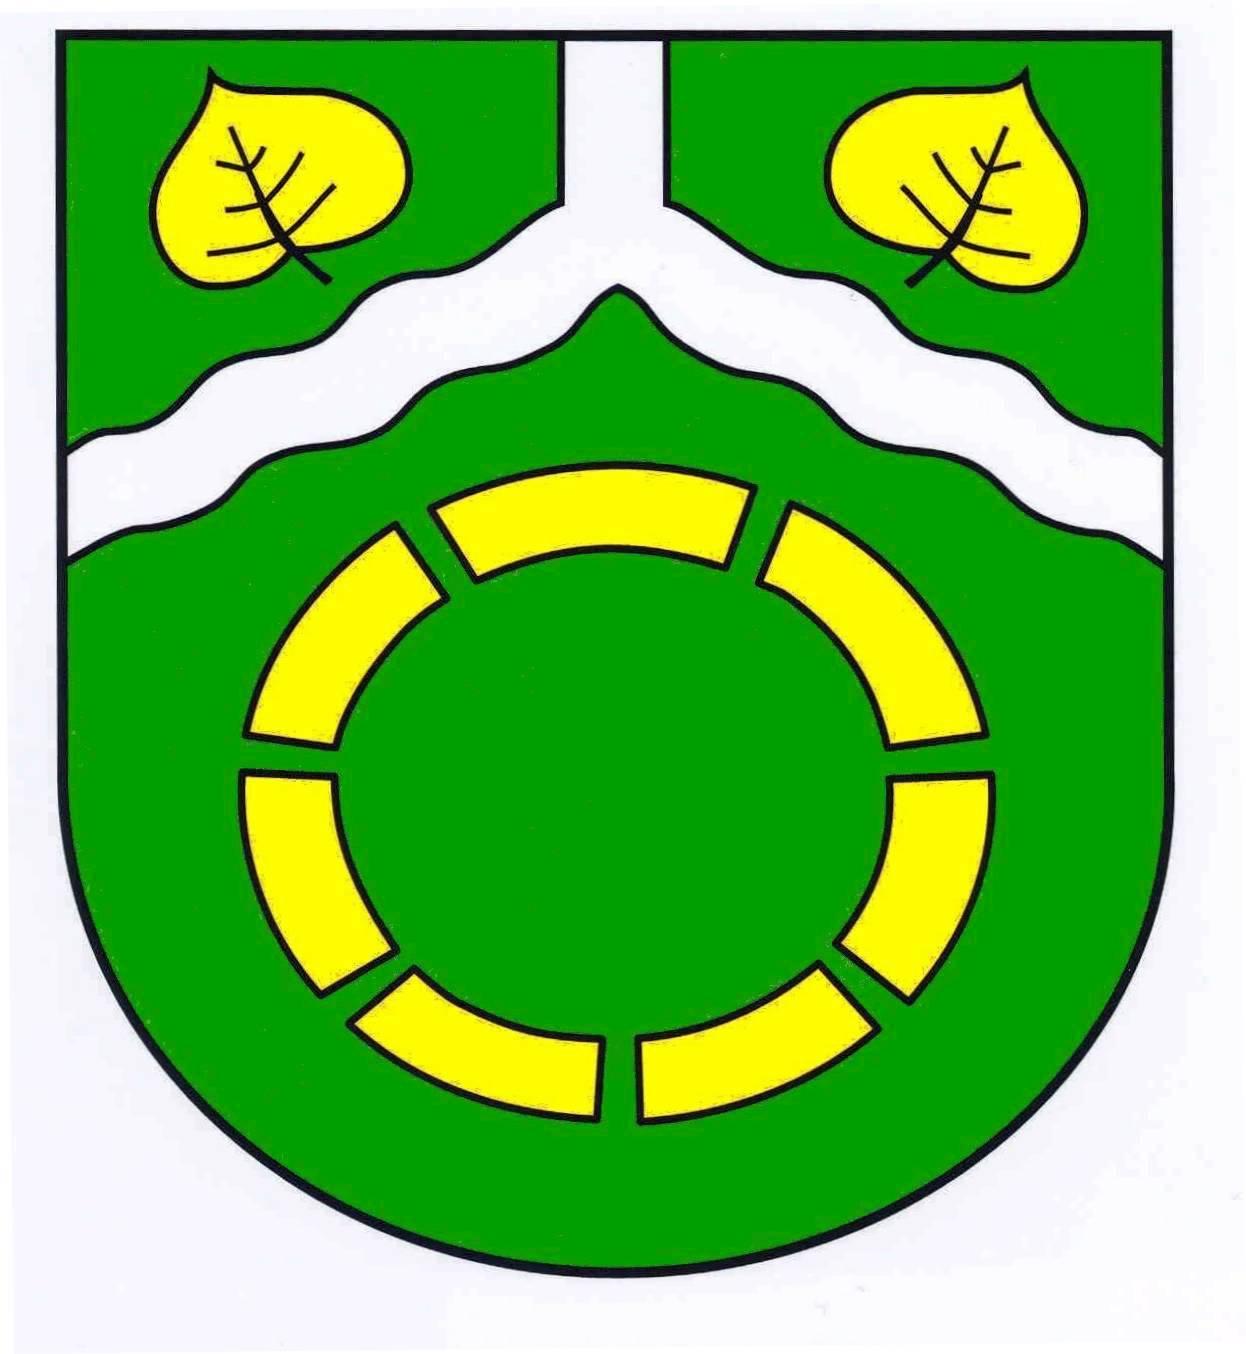 Wappen GemeindeOering, Kreis Segeberg